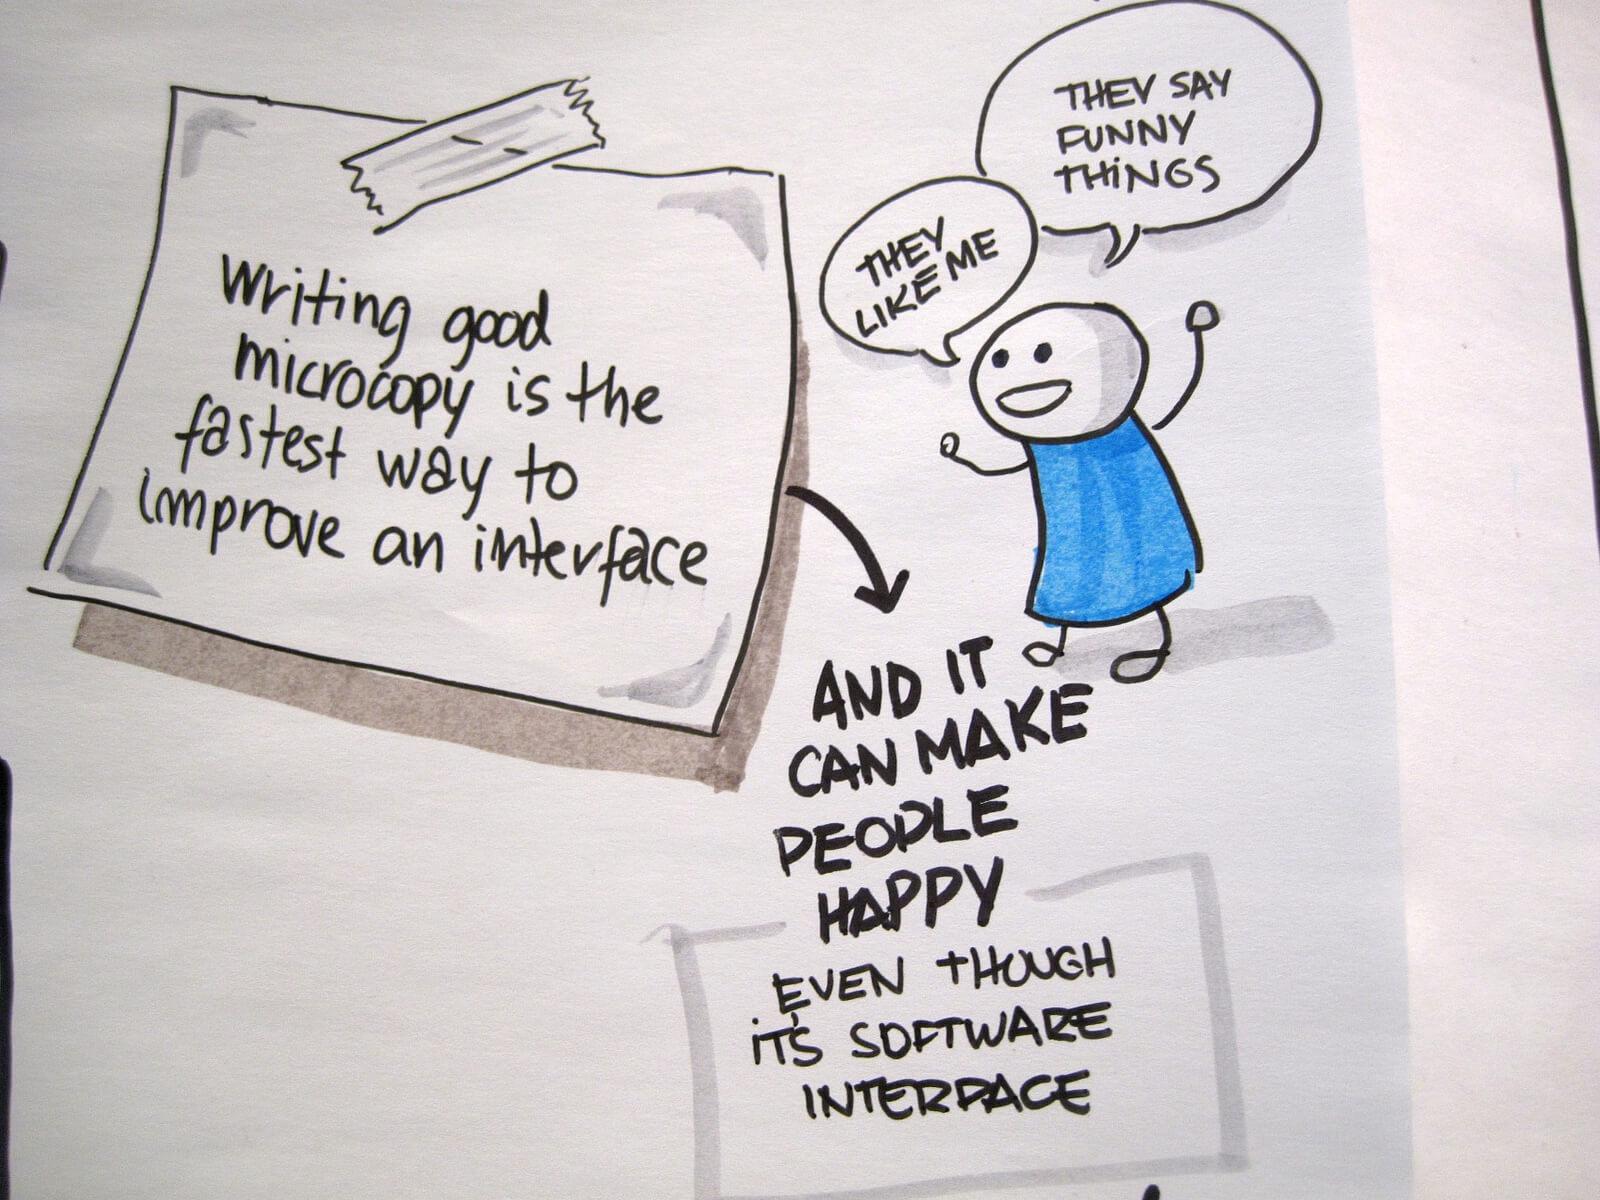 improving an interface through ux writing